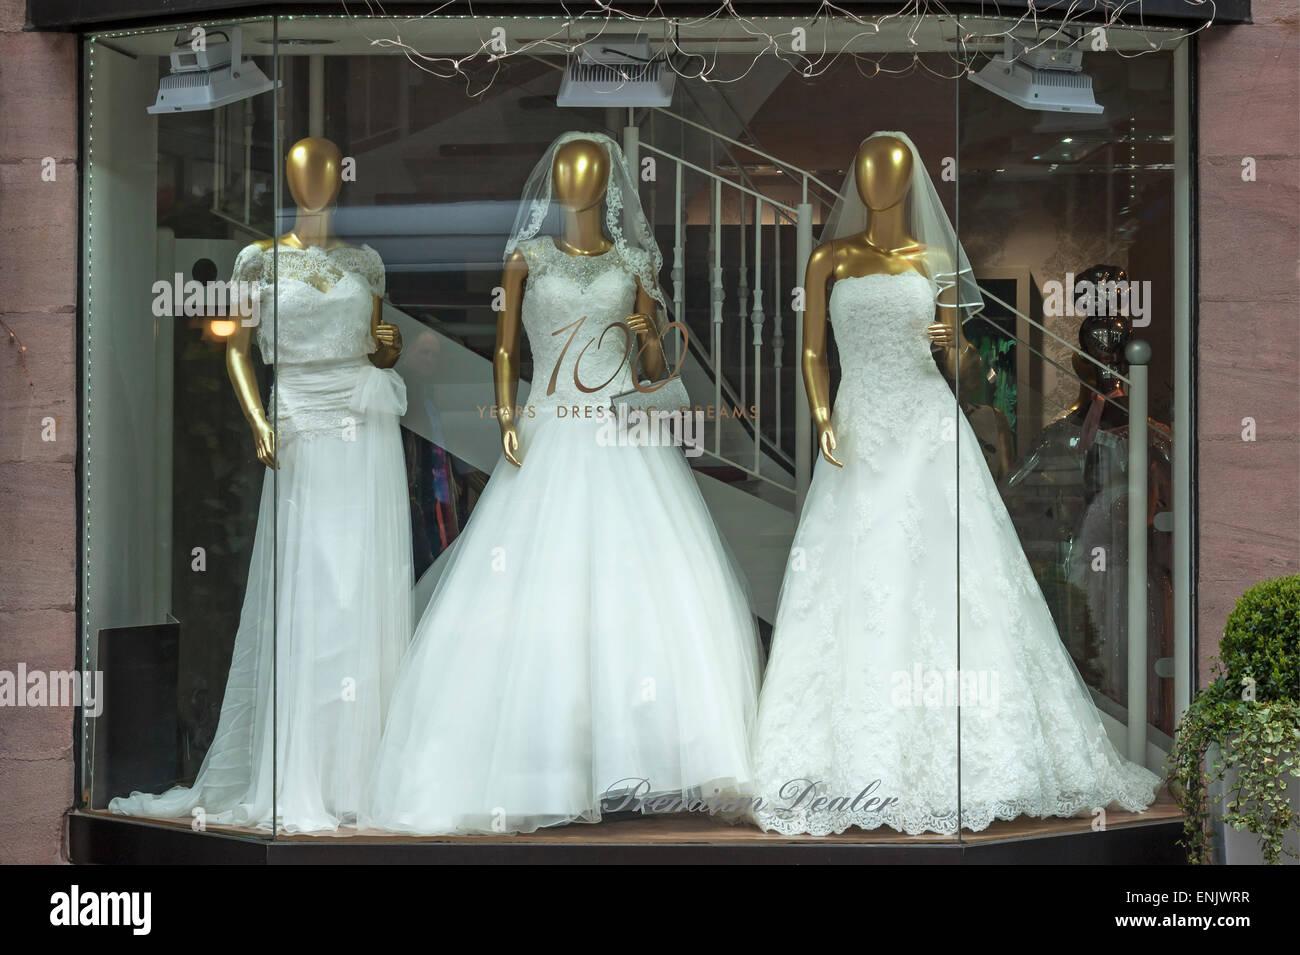 Wedding Shop Window Stock Photos & Wedding Shop Window Stock Images ...